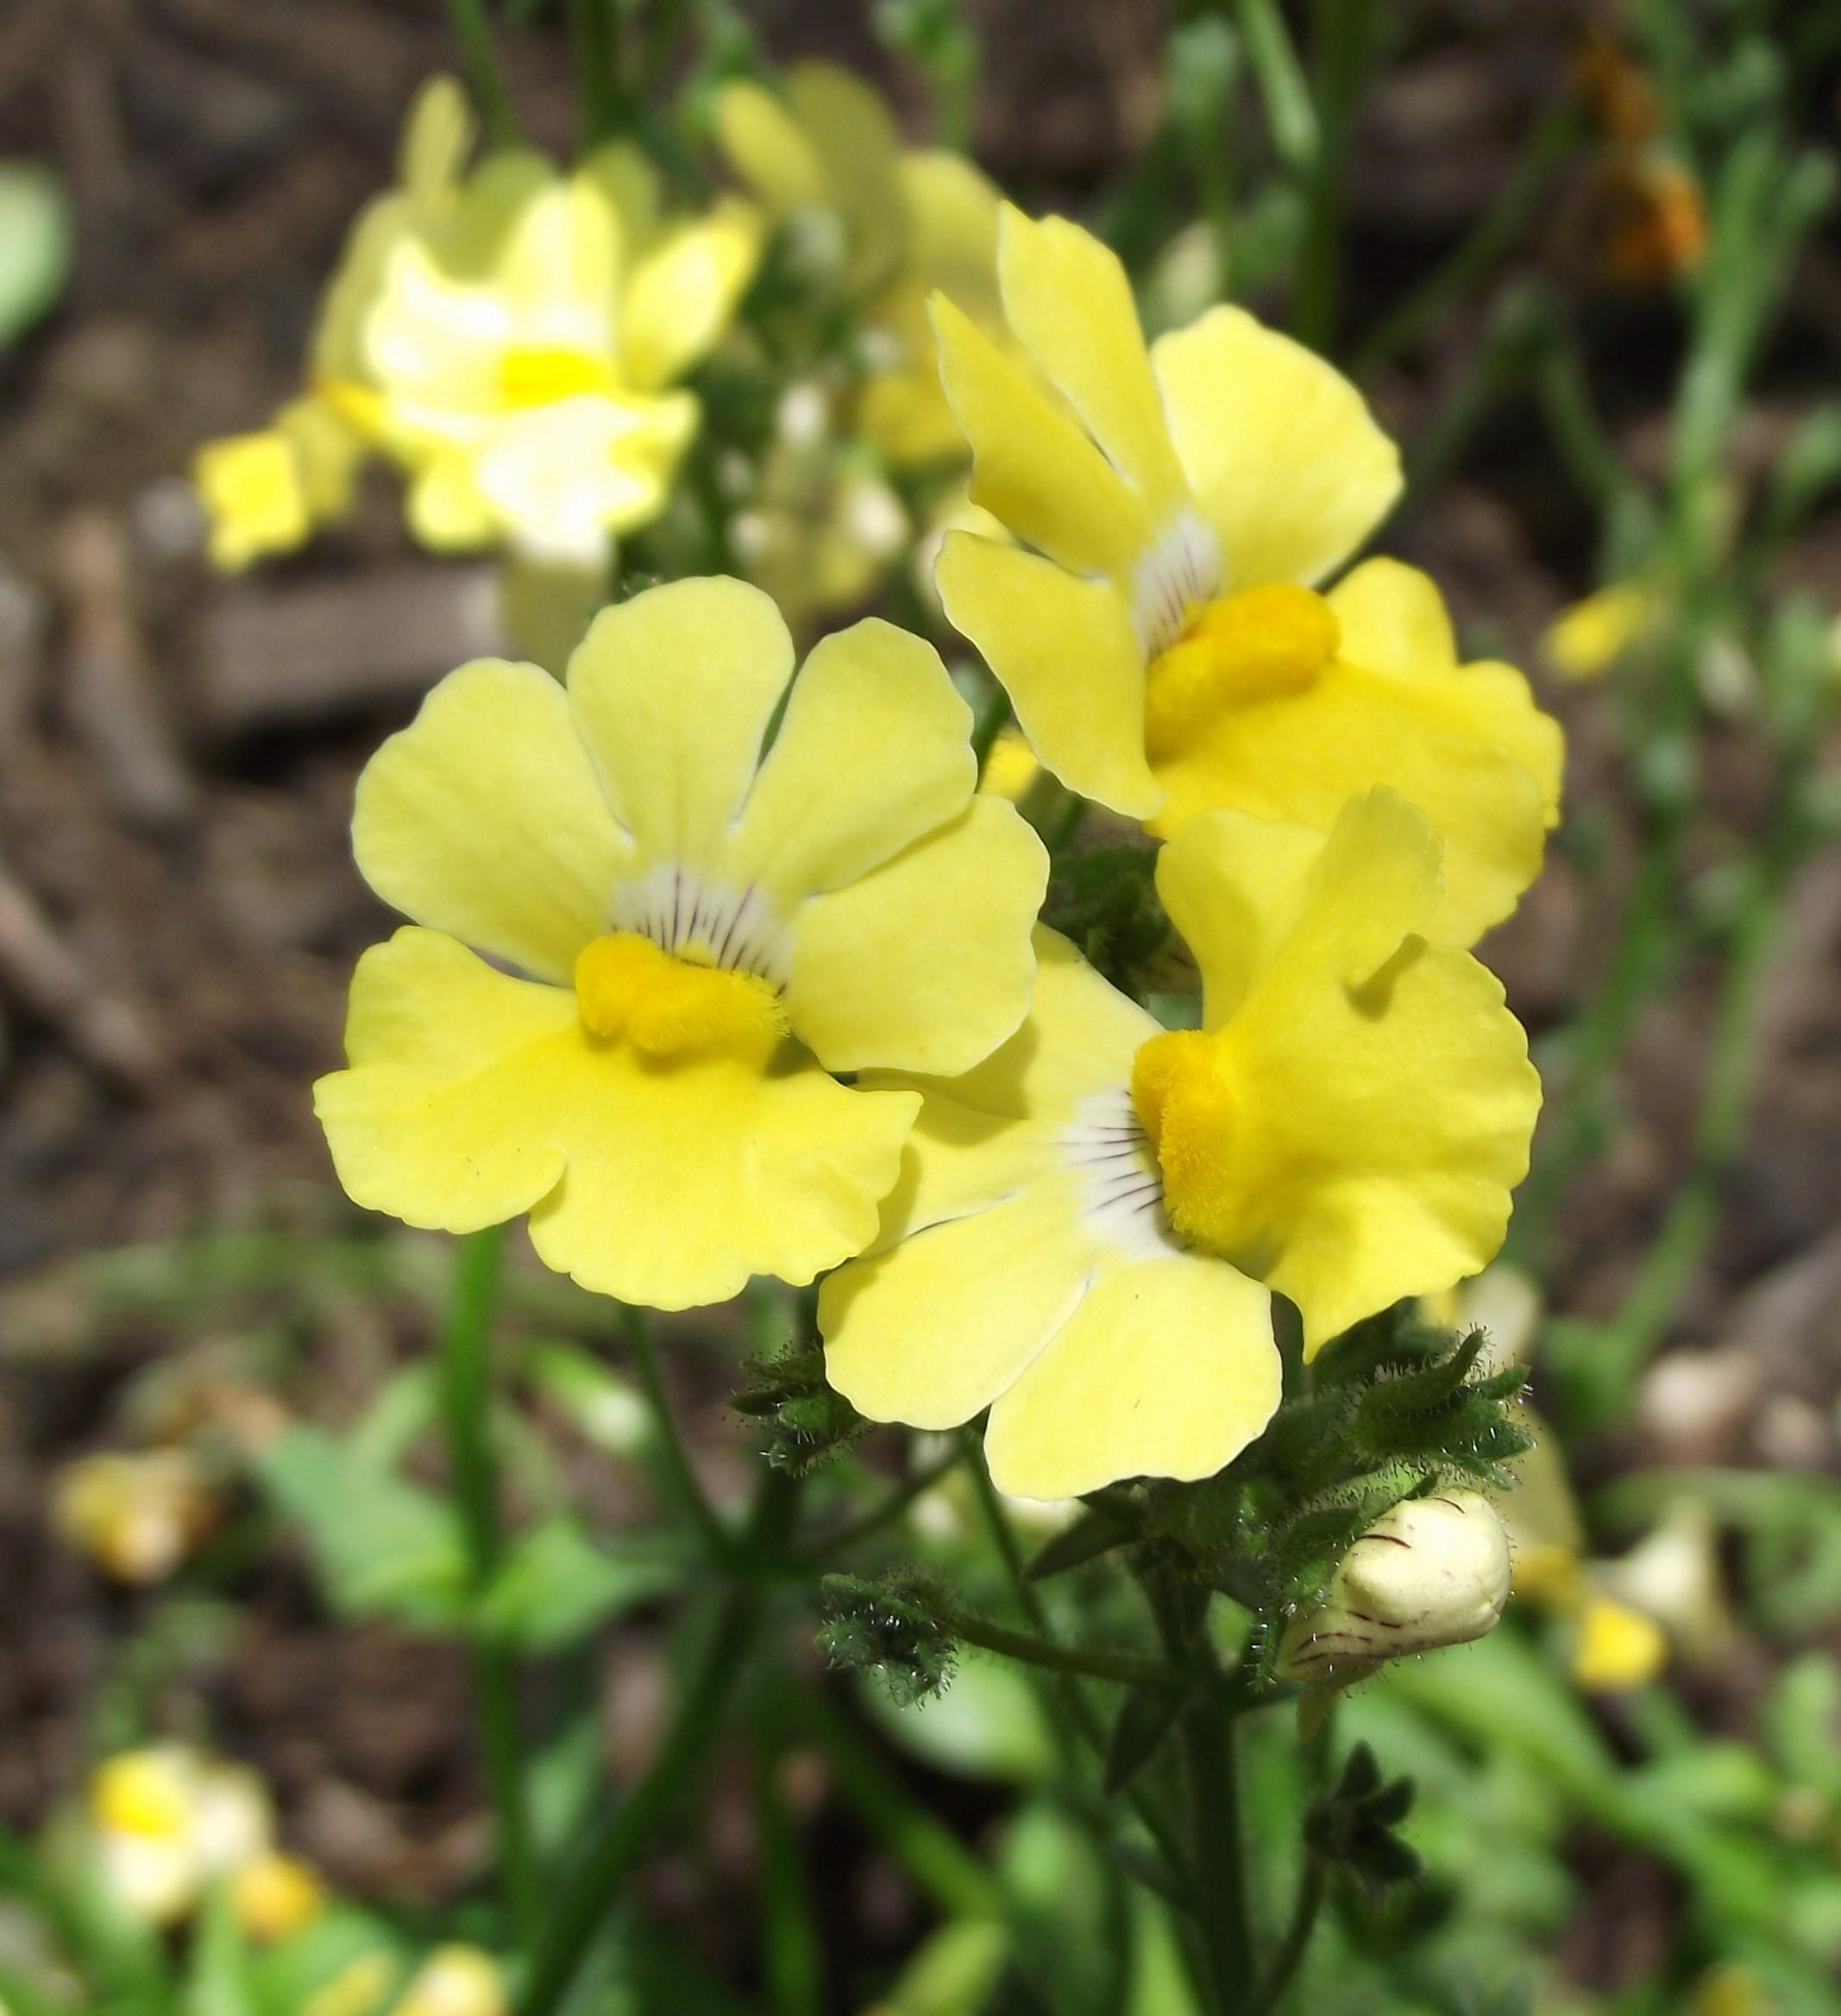 California Lemon Law >> File:Nemesia-sunsatialemon.jpg - Wikimedia Commons